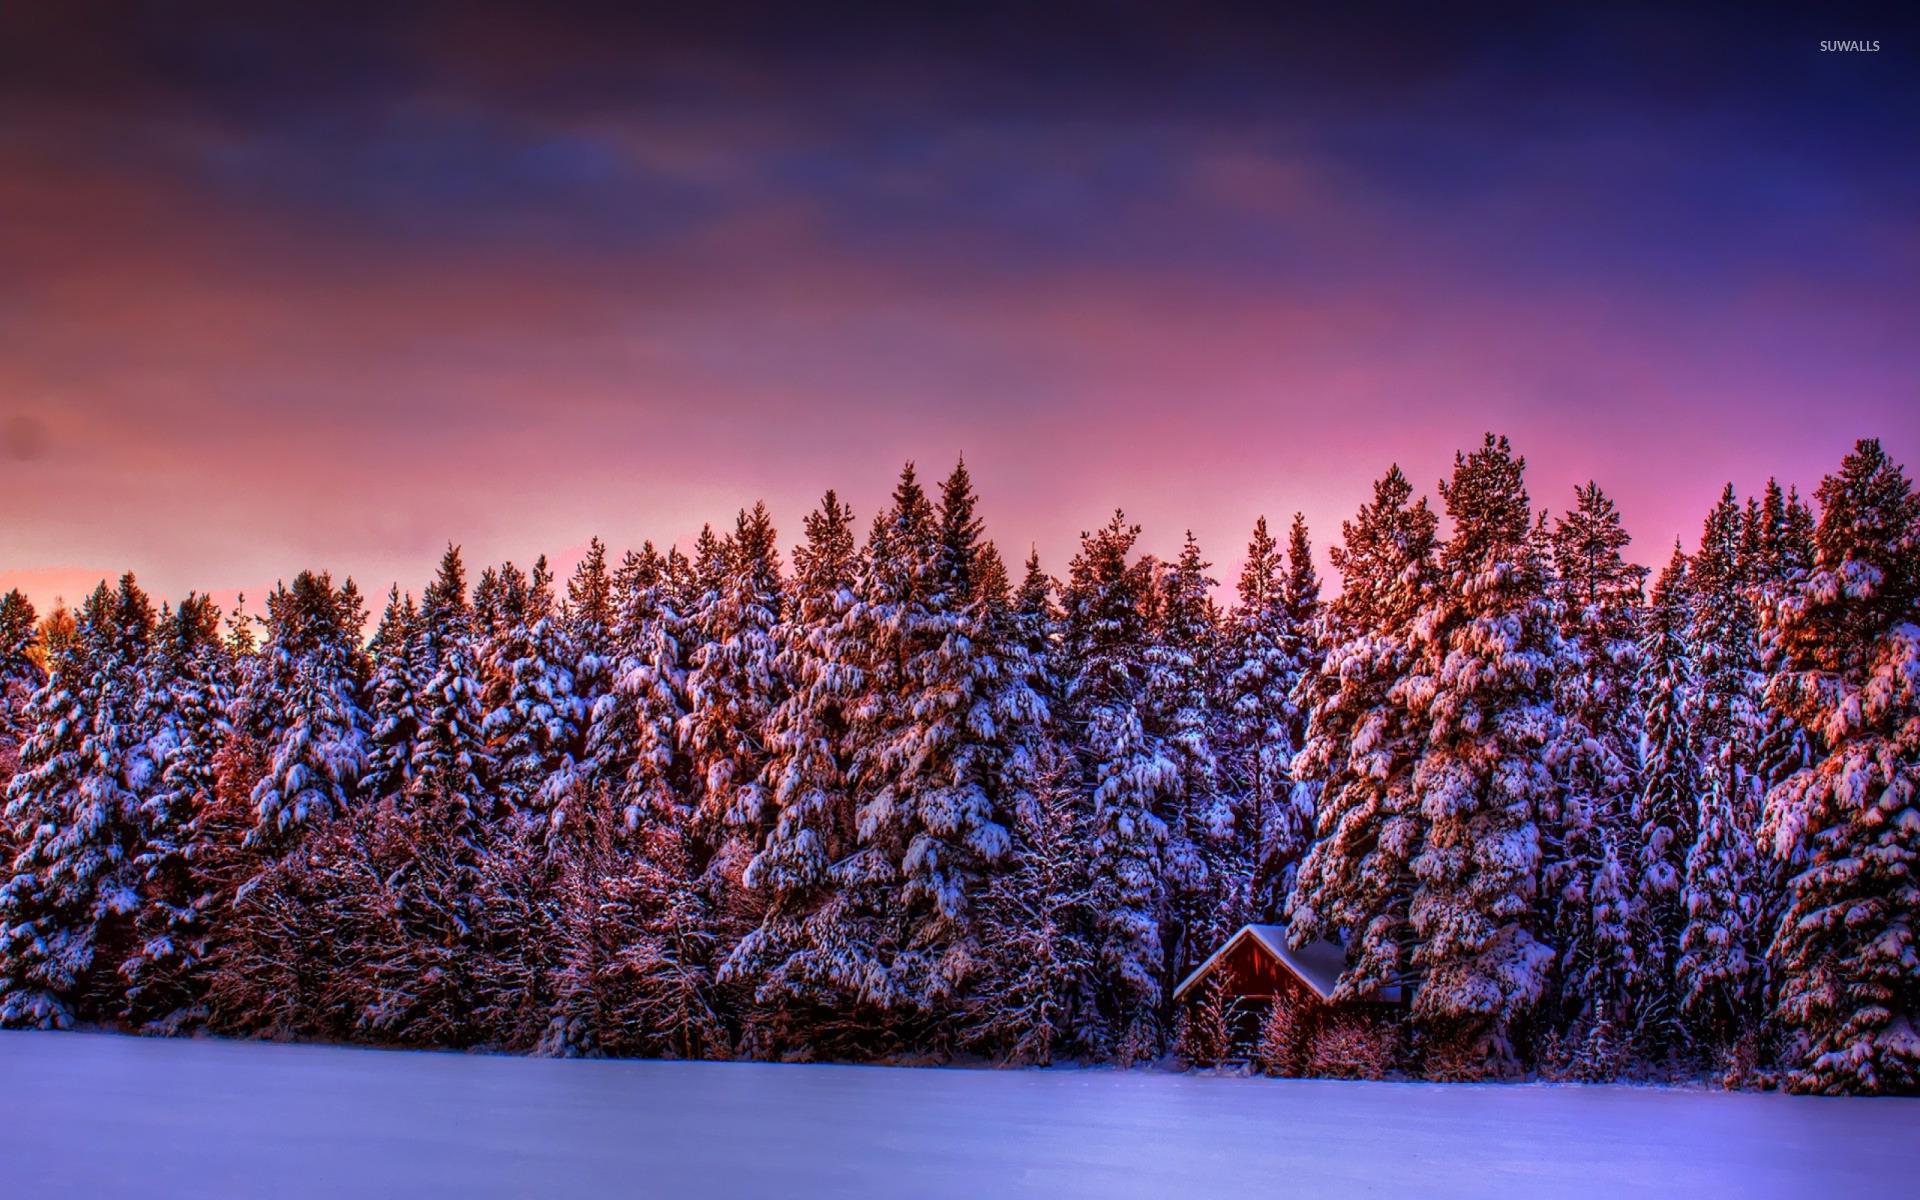 Purple Winter Sky Wallpaper Nature Wallpapers 16900